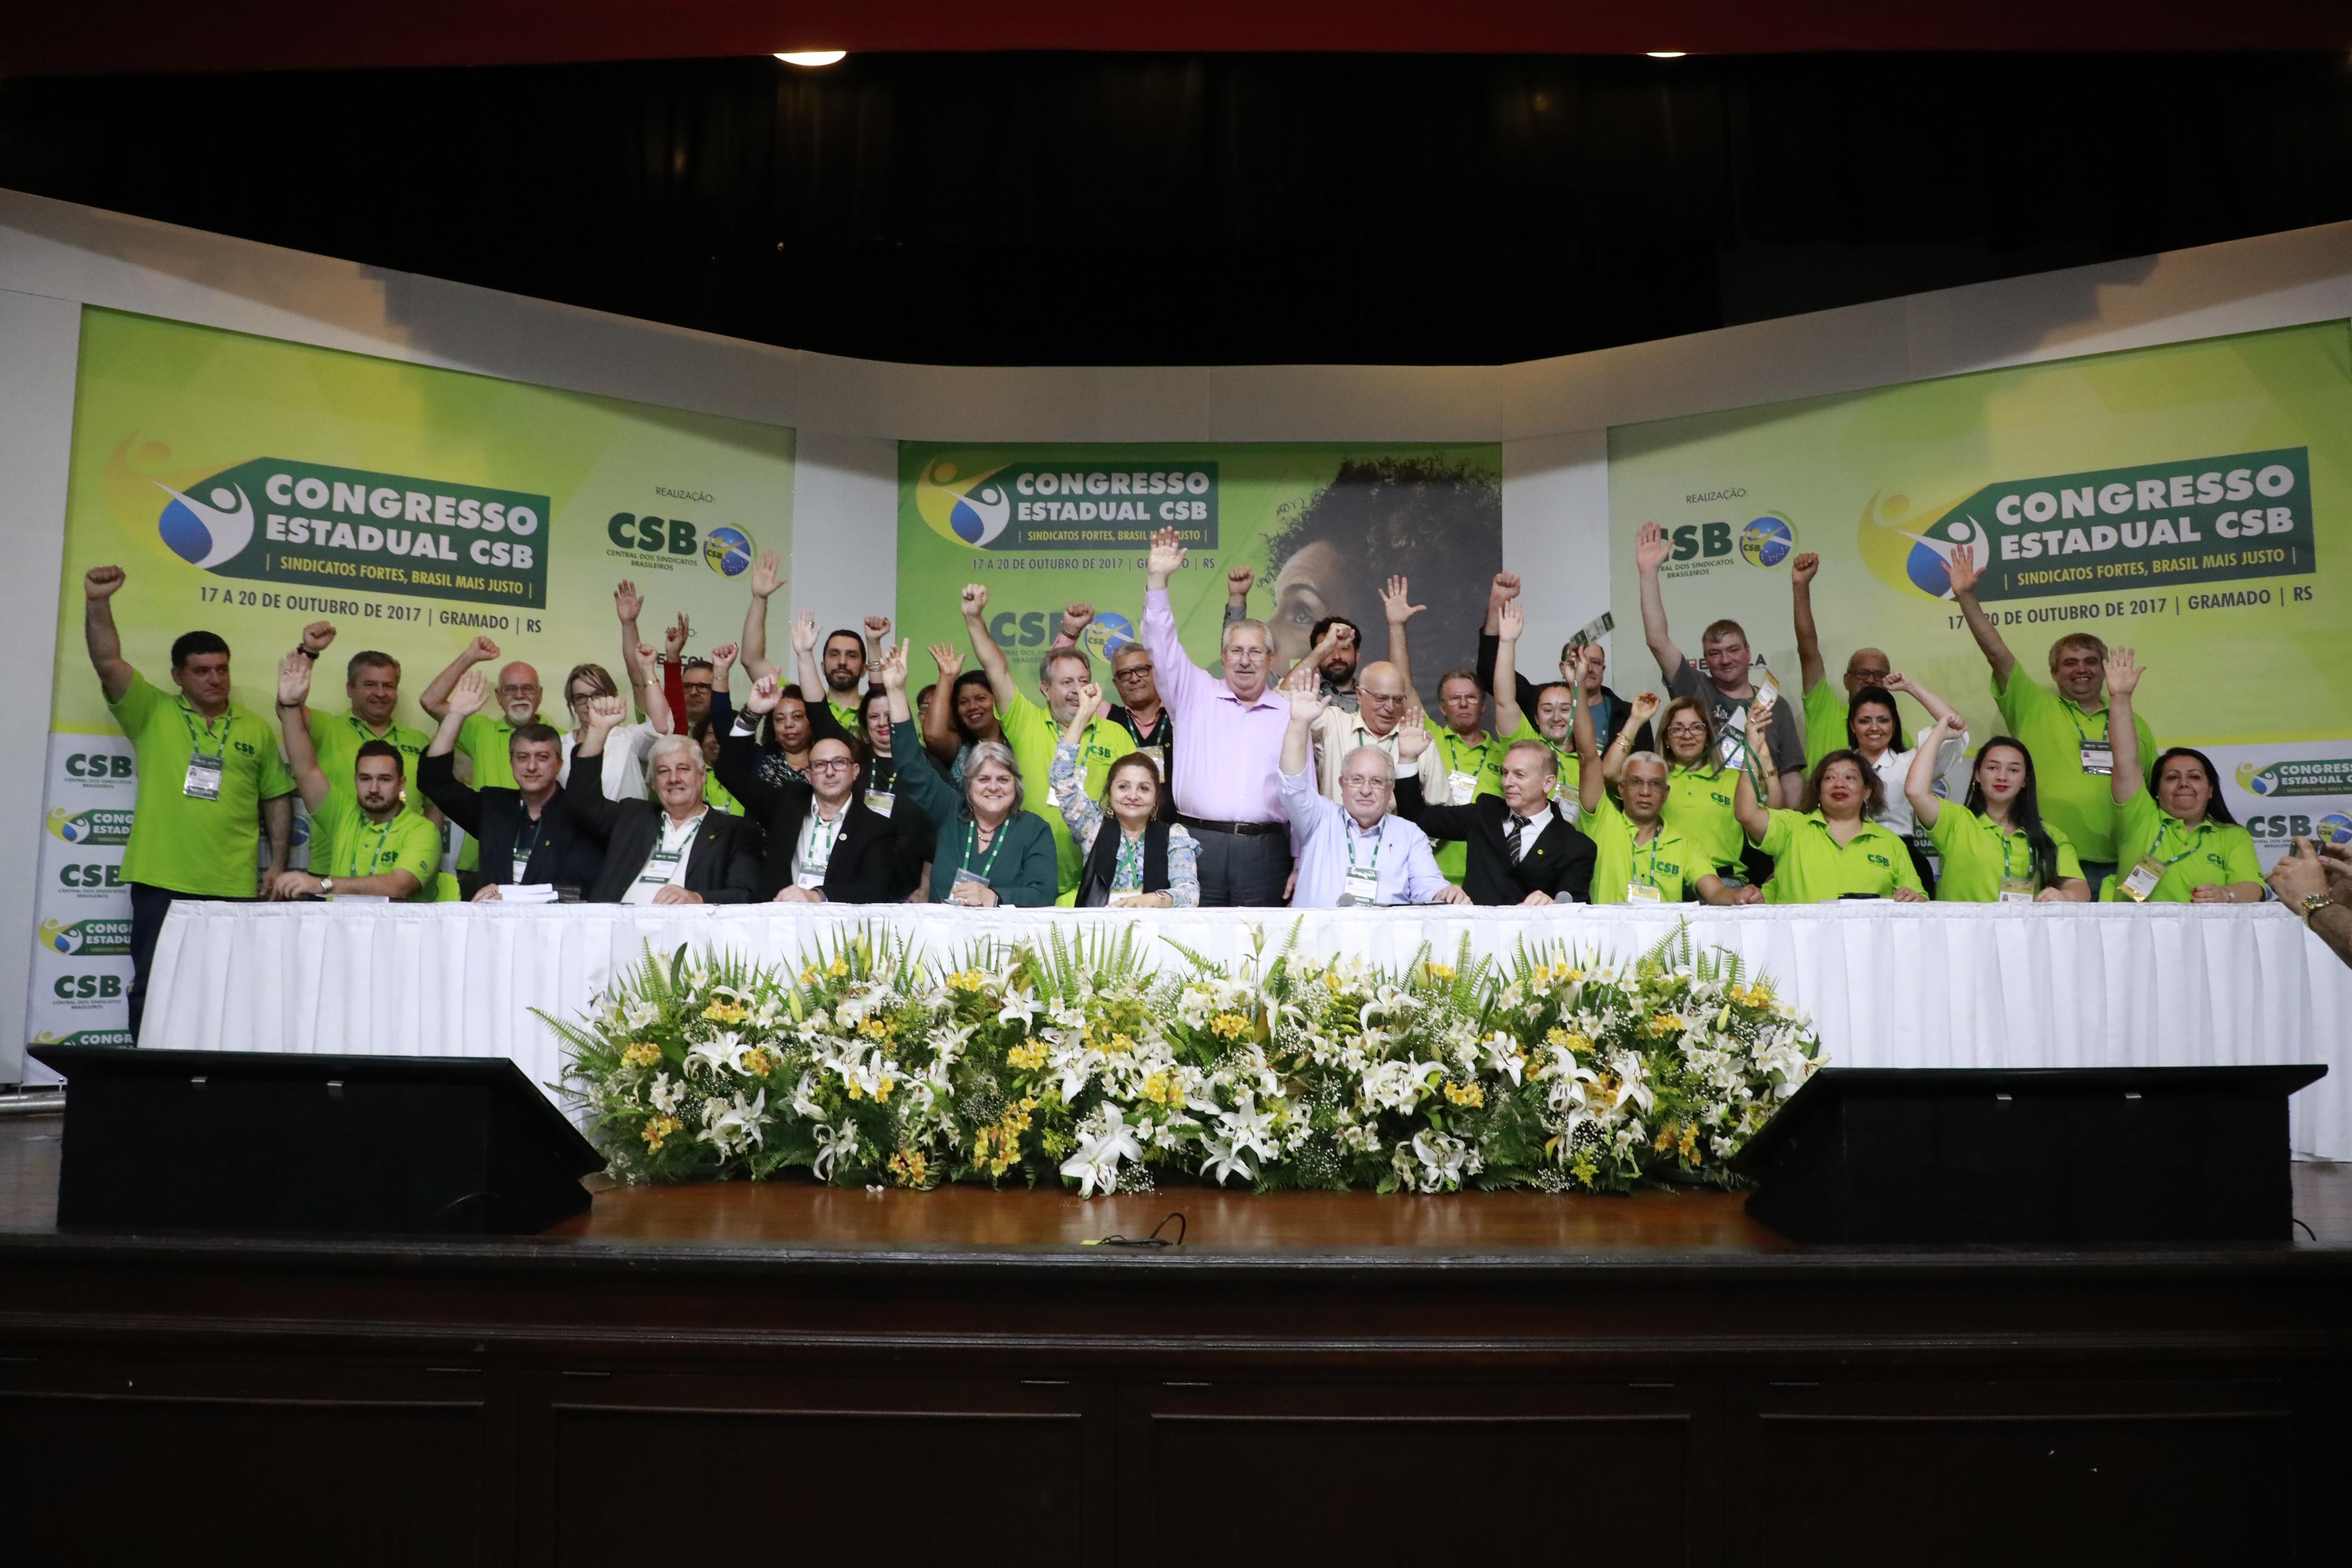 Congresso Estadual do Rio Grande do Sul – 17 a 20 de outubro | 2017